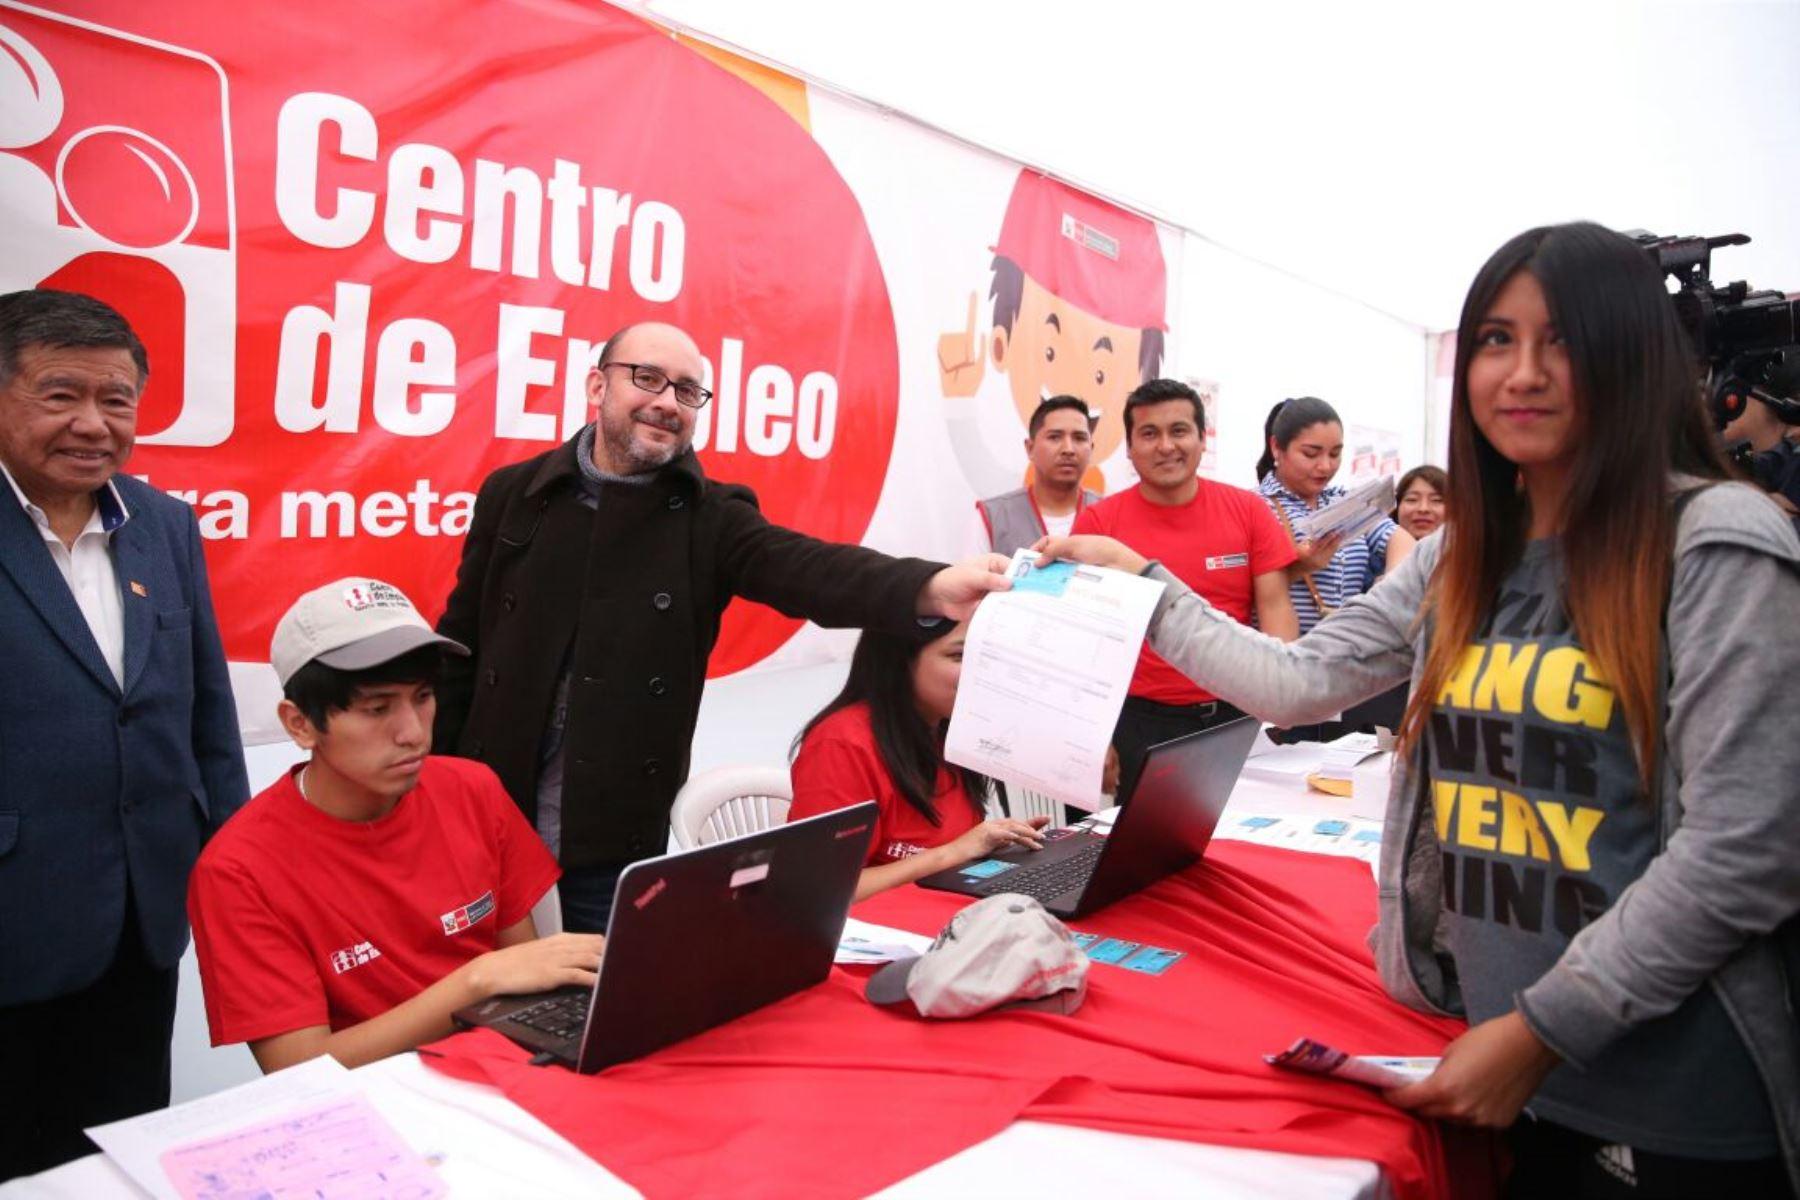 Ministro de Trabajo, Christian Sánchez inauguró Semana del Empleo en Huacho, Lima.ANDINA/Difusión